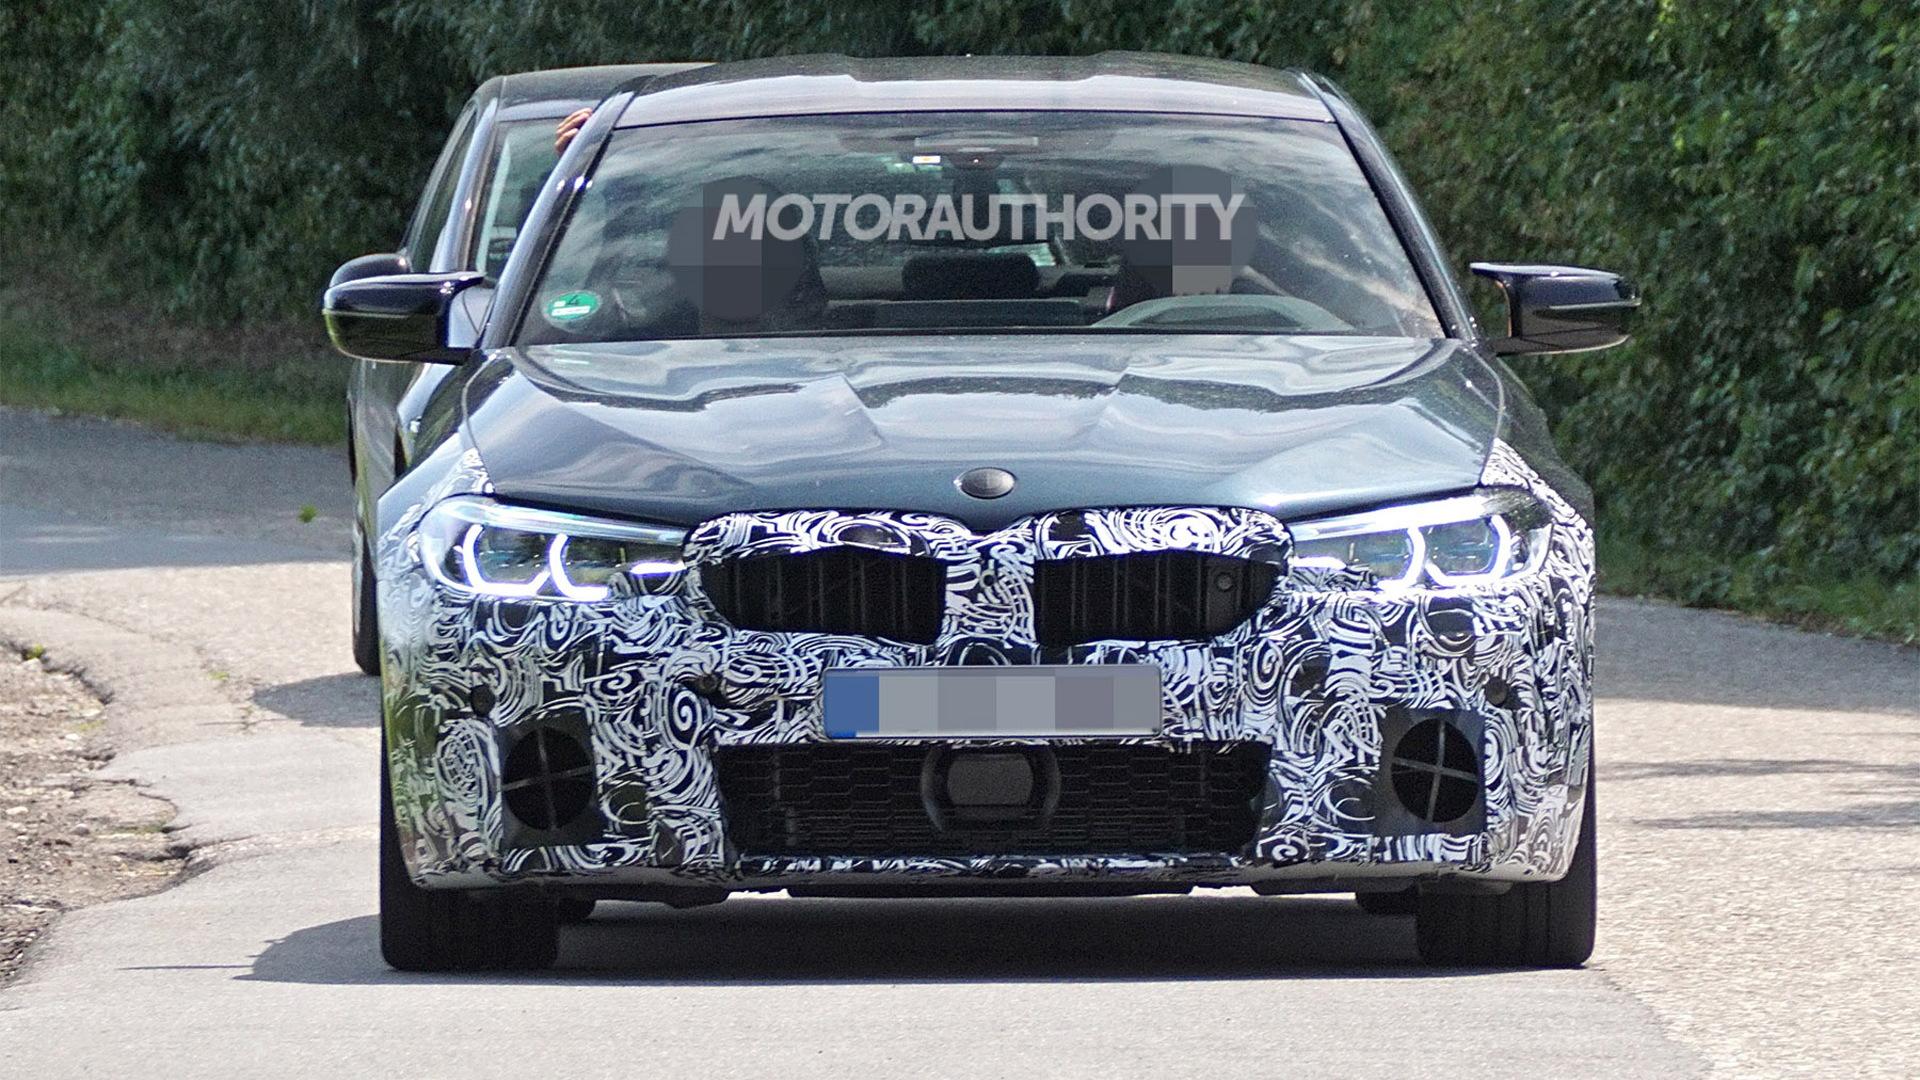 2021 BMW M5 facelift spy shots - Image via S. Baldauf/SB-Medien